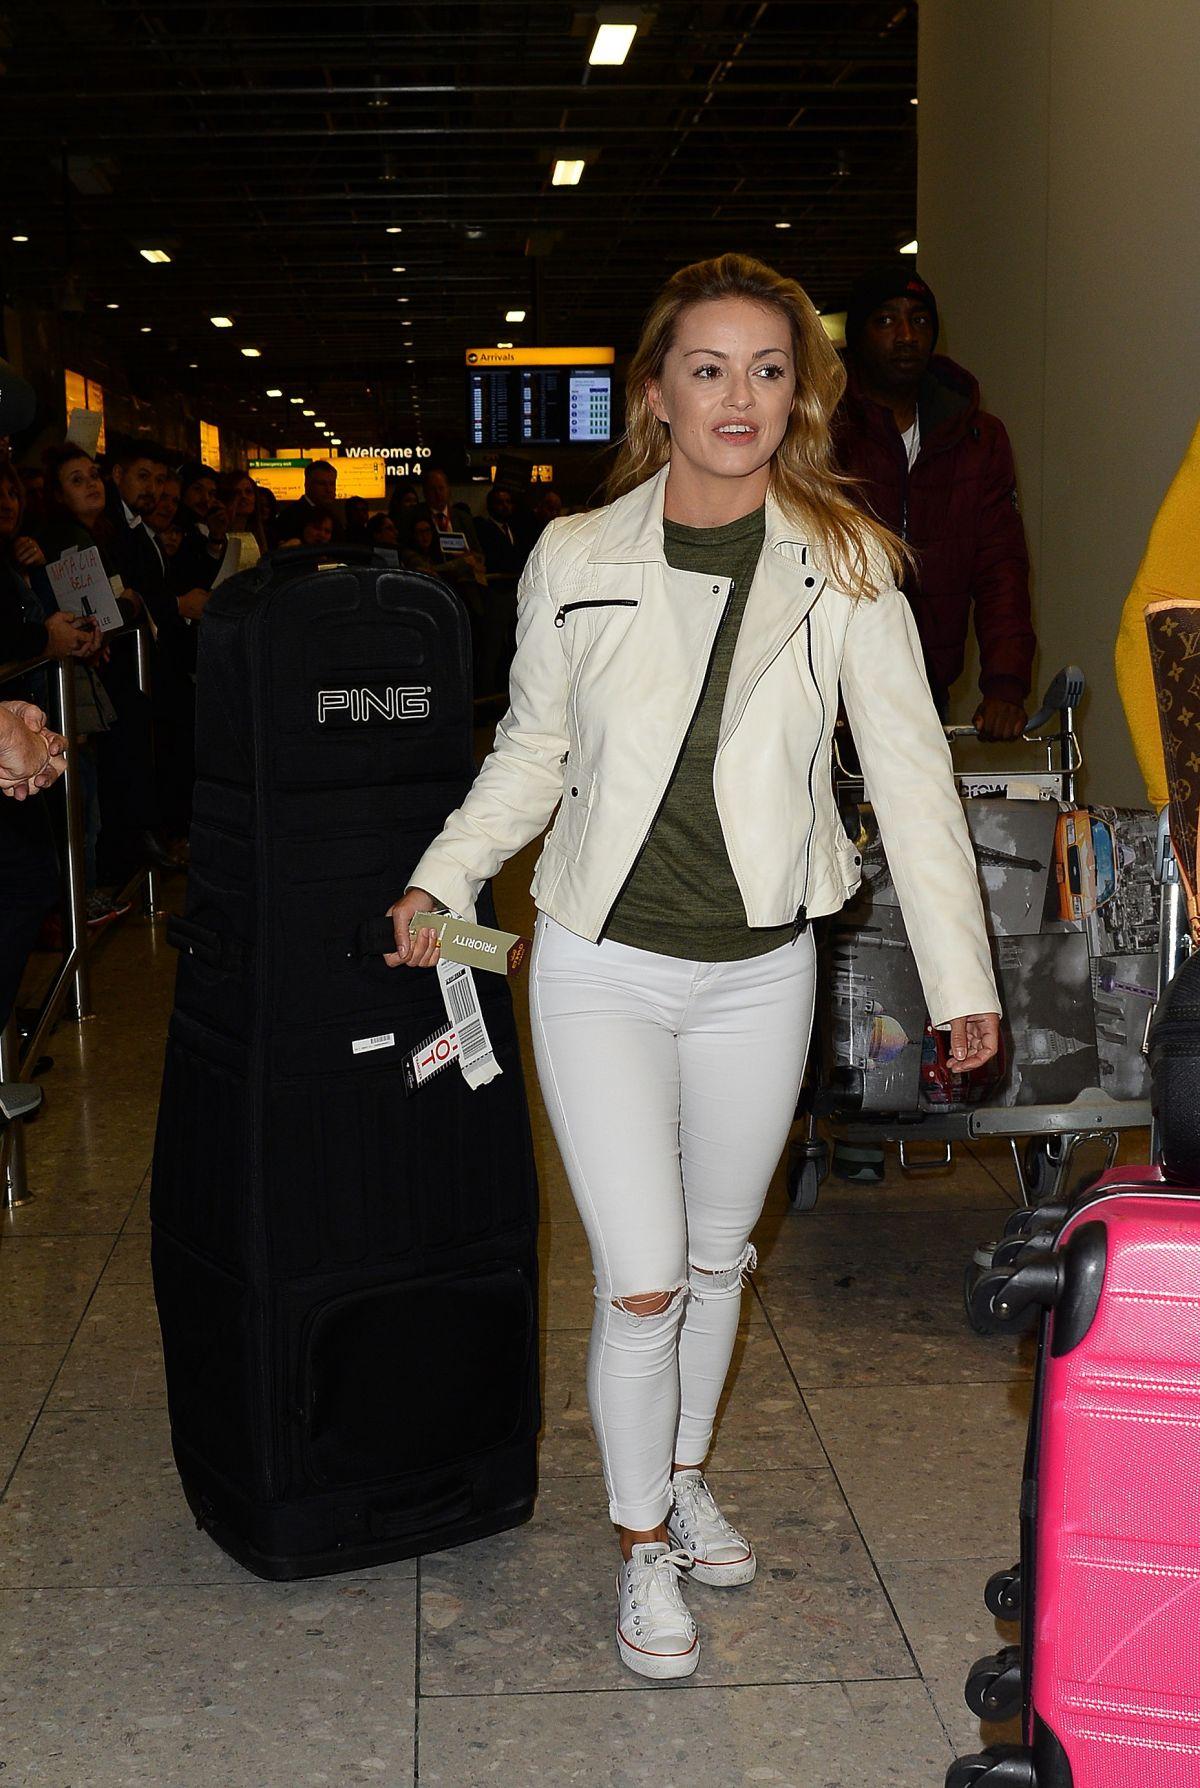 OLA JORDAN at Heathrow Airport in London 12/07/2016